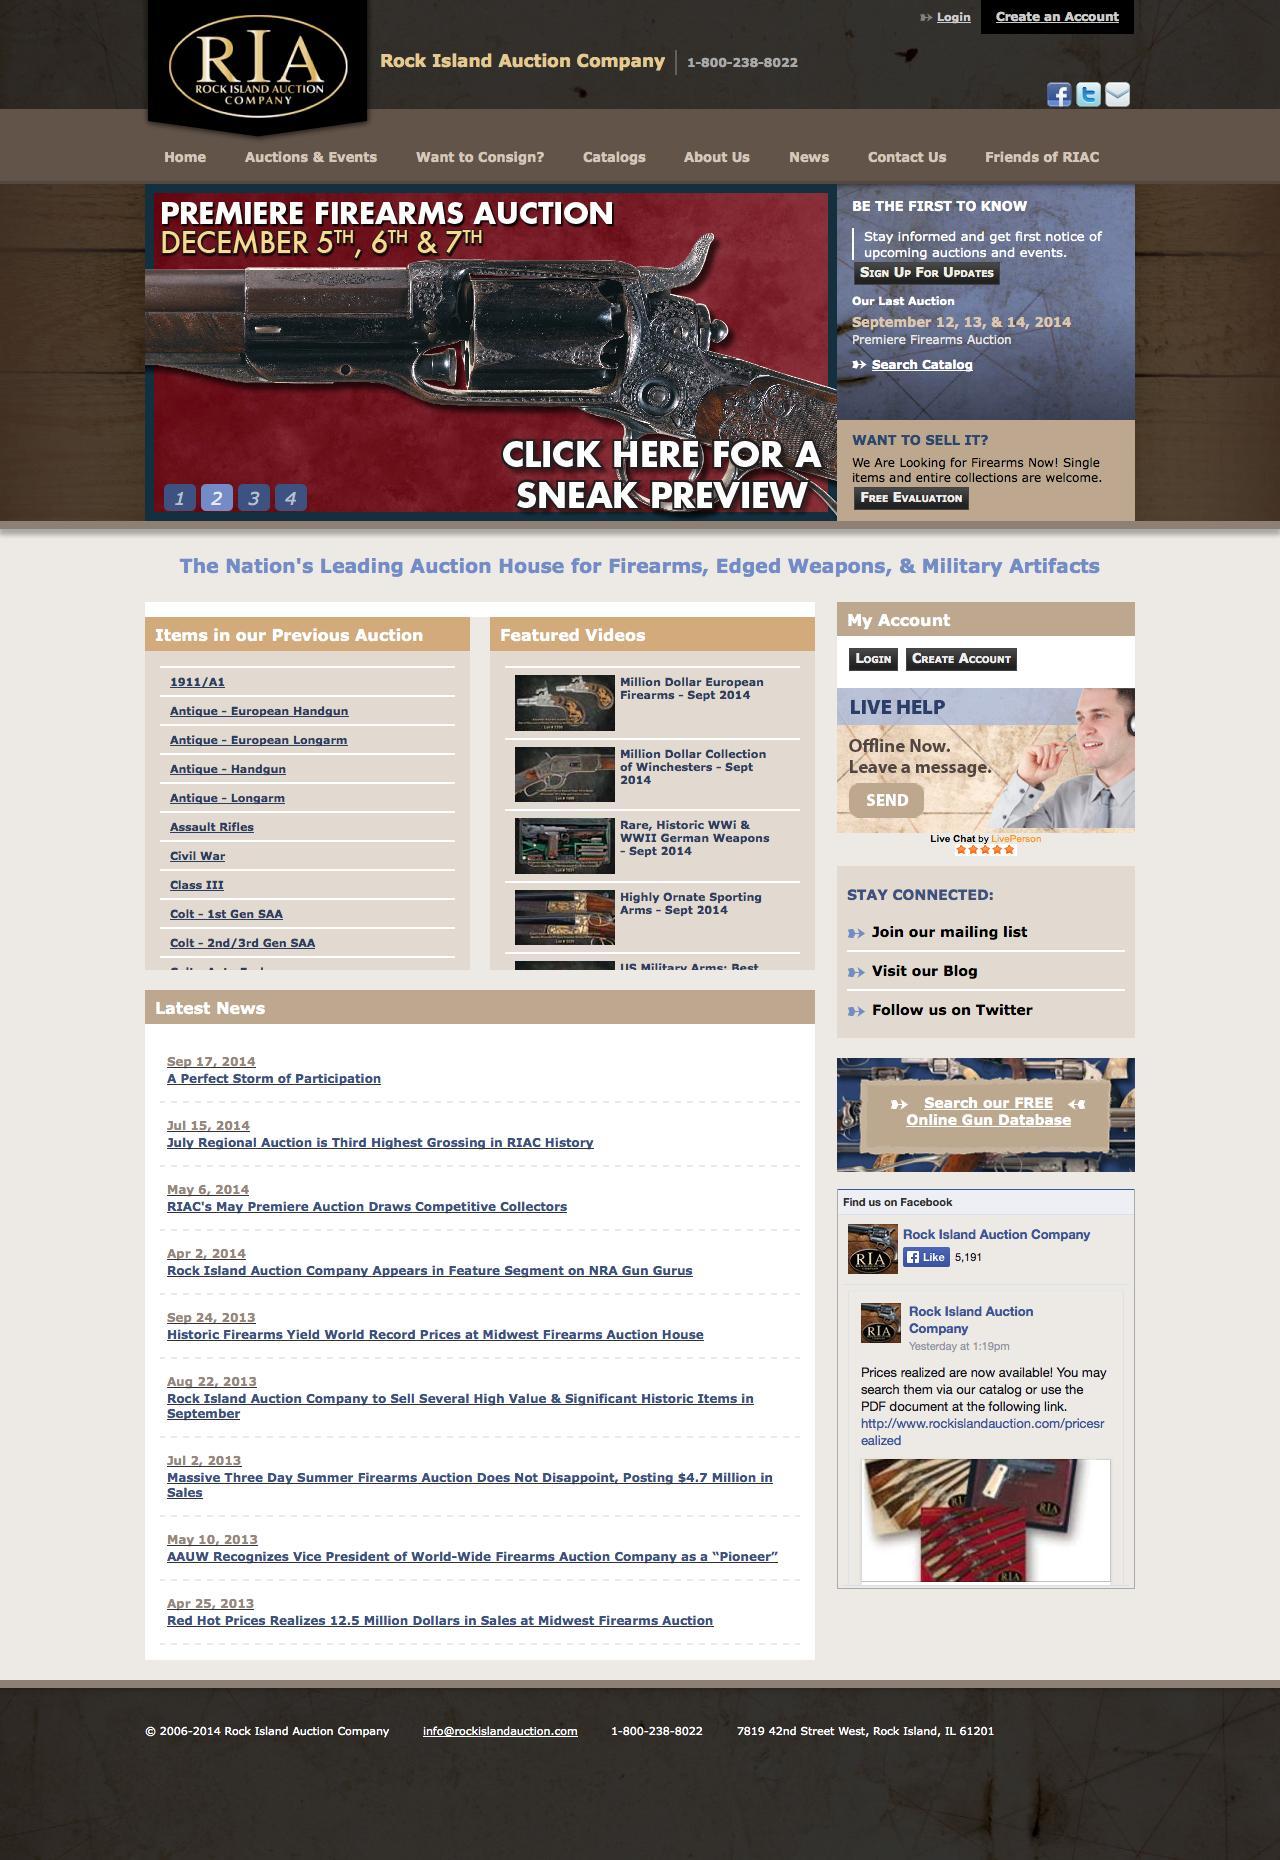 Screenshot of rockislandauction.com - Antique & Collectors Firearms Auction - Sell Your Guns - captured Sept. 18, 2014